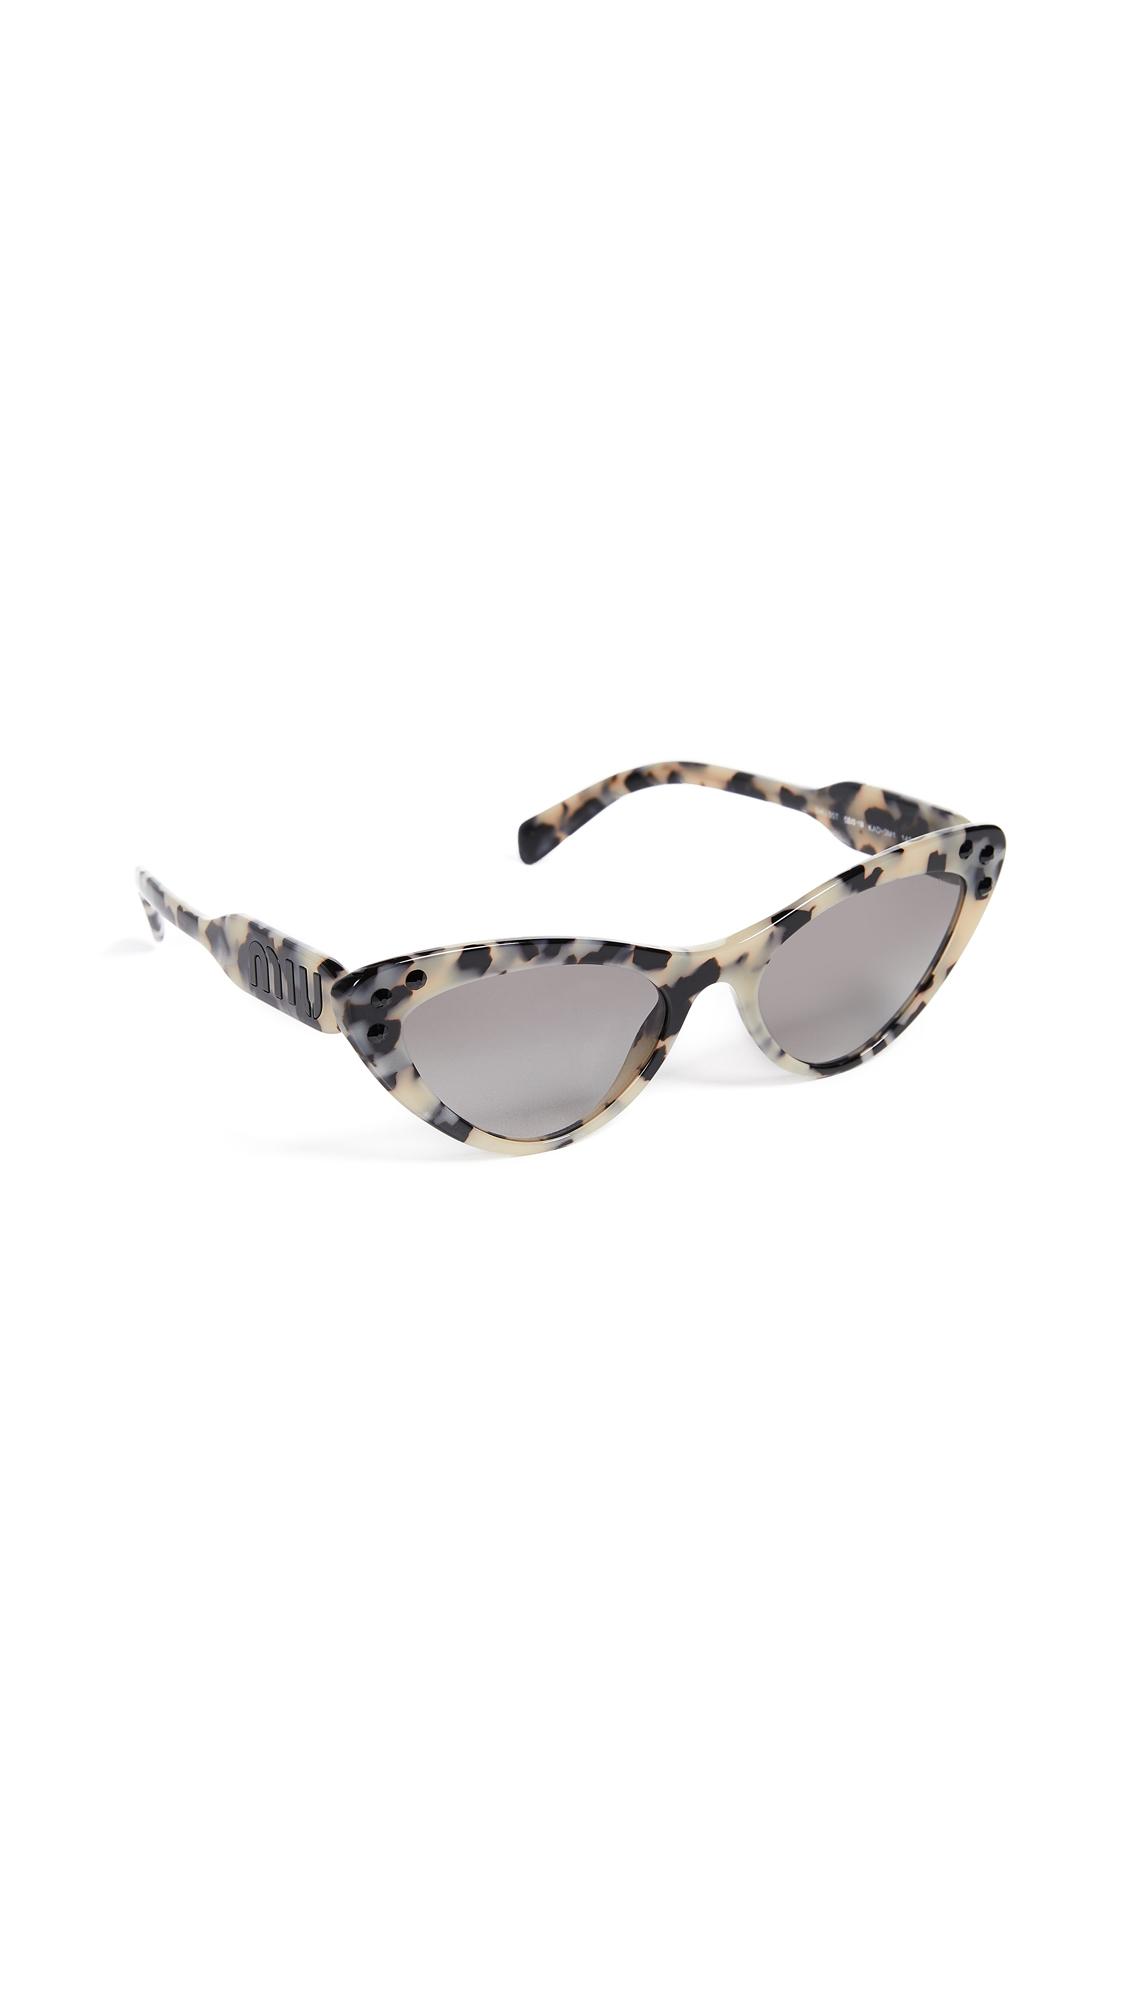 Crystals Cat Eye Sunglasses in Sand Havana Moro/Grey Gradient